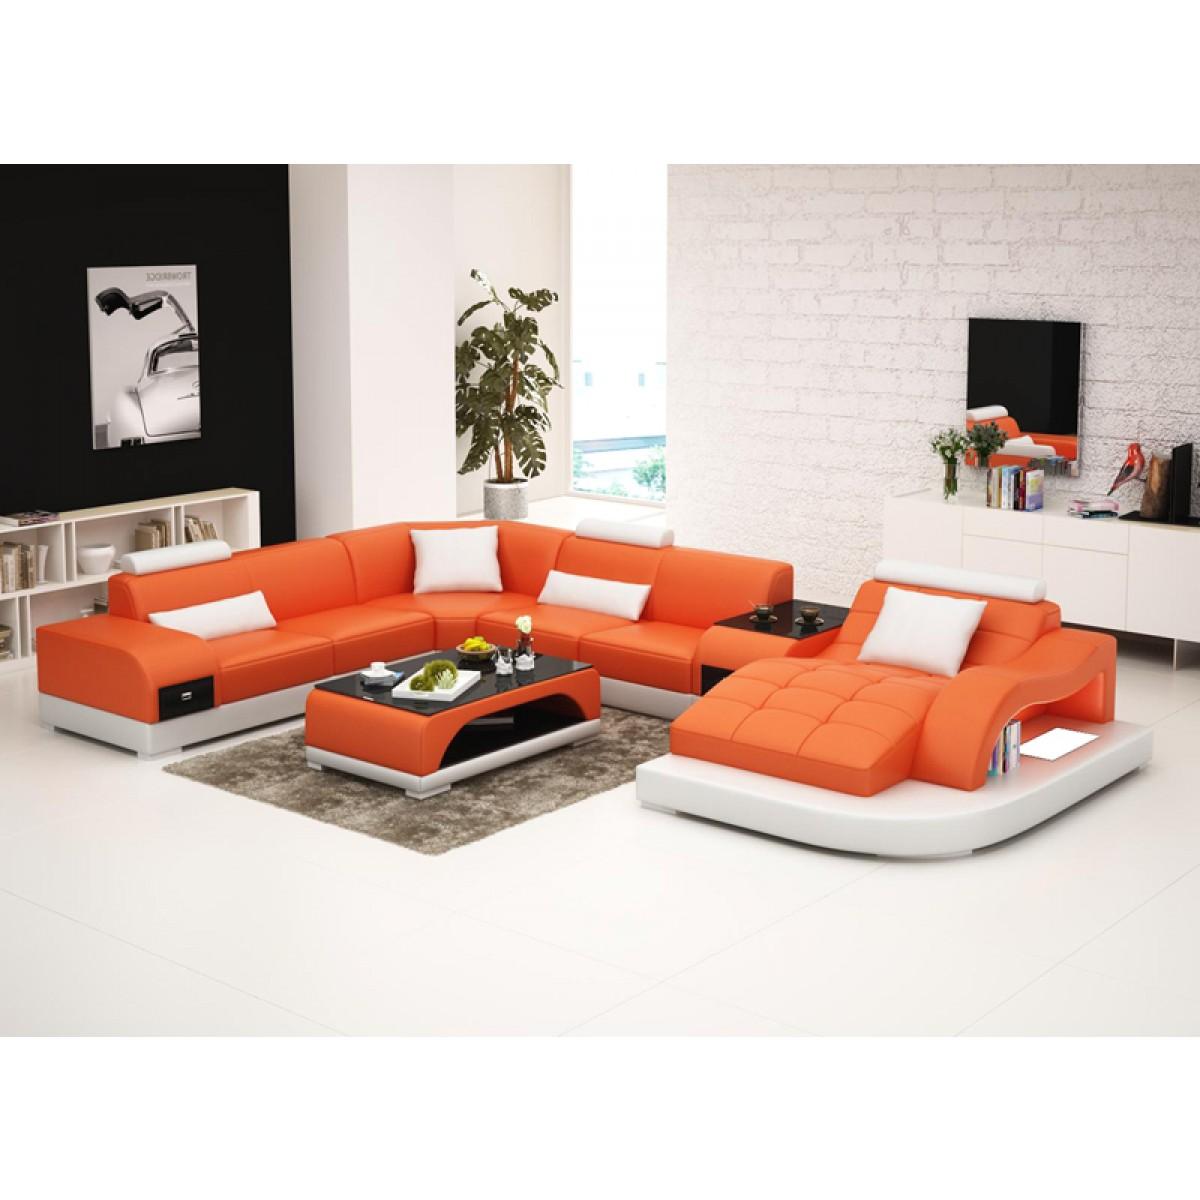 canap d 39 angle panoramique en cuir almeria table int gr e clairag. Black Bedroom Furniture Sets. Home Design Ideas